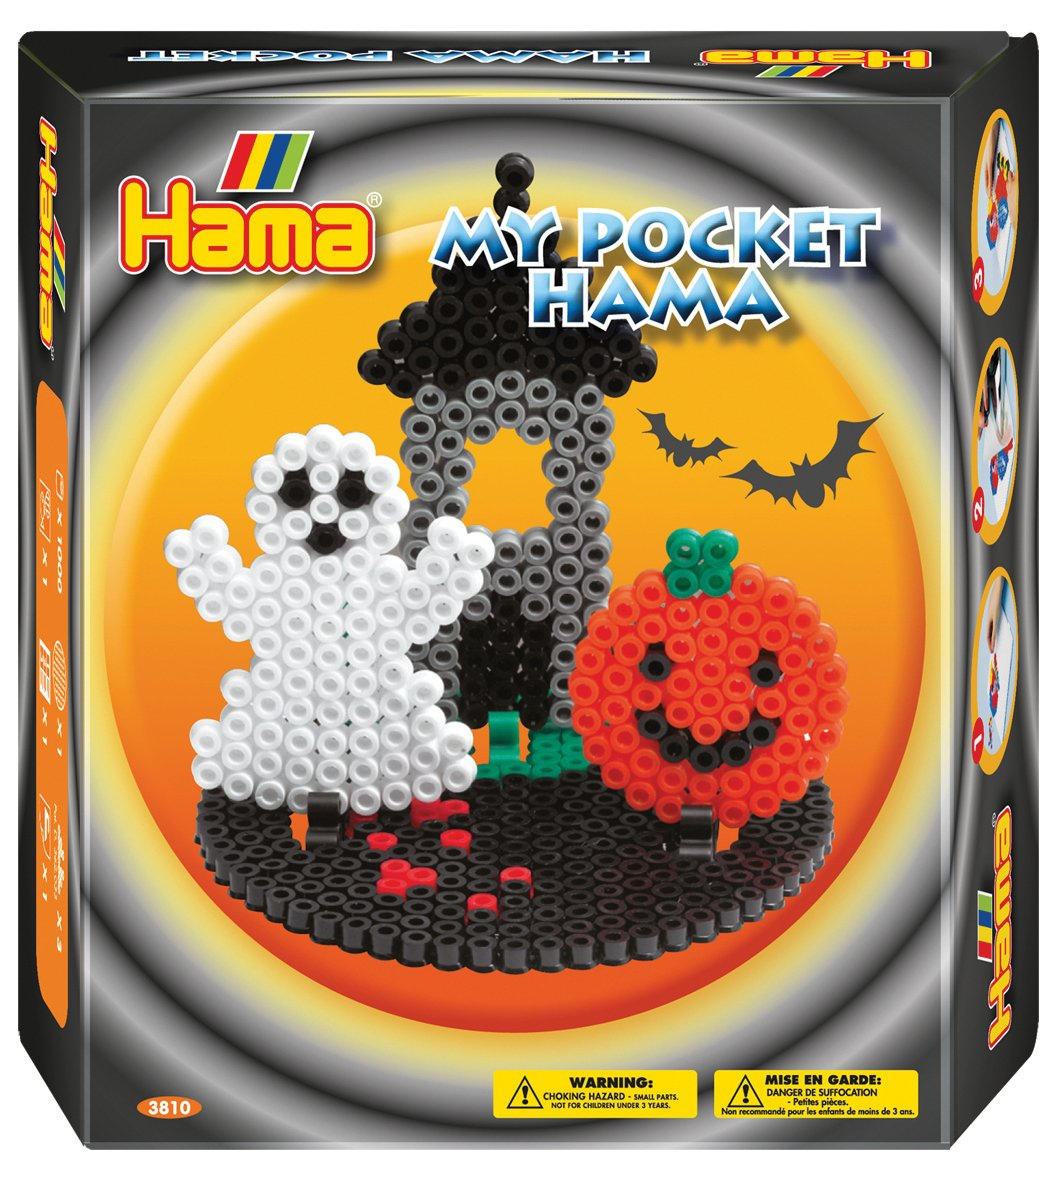 Hama My Pocket Halloween: Amazon.co.uk: Toys & Games